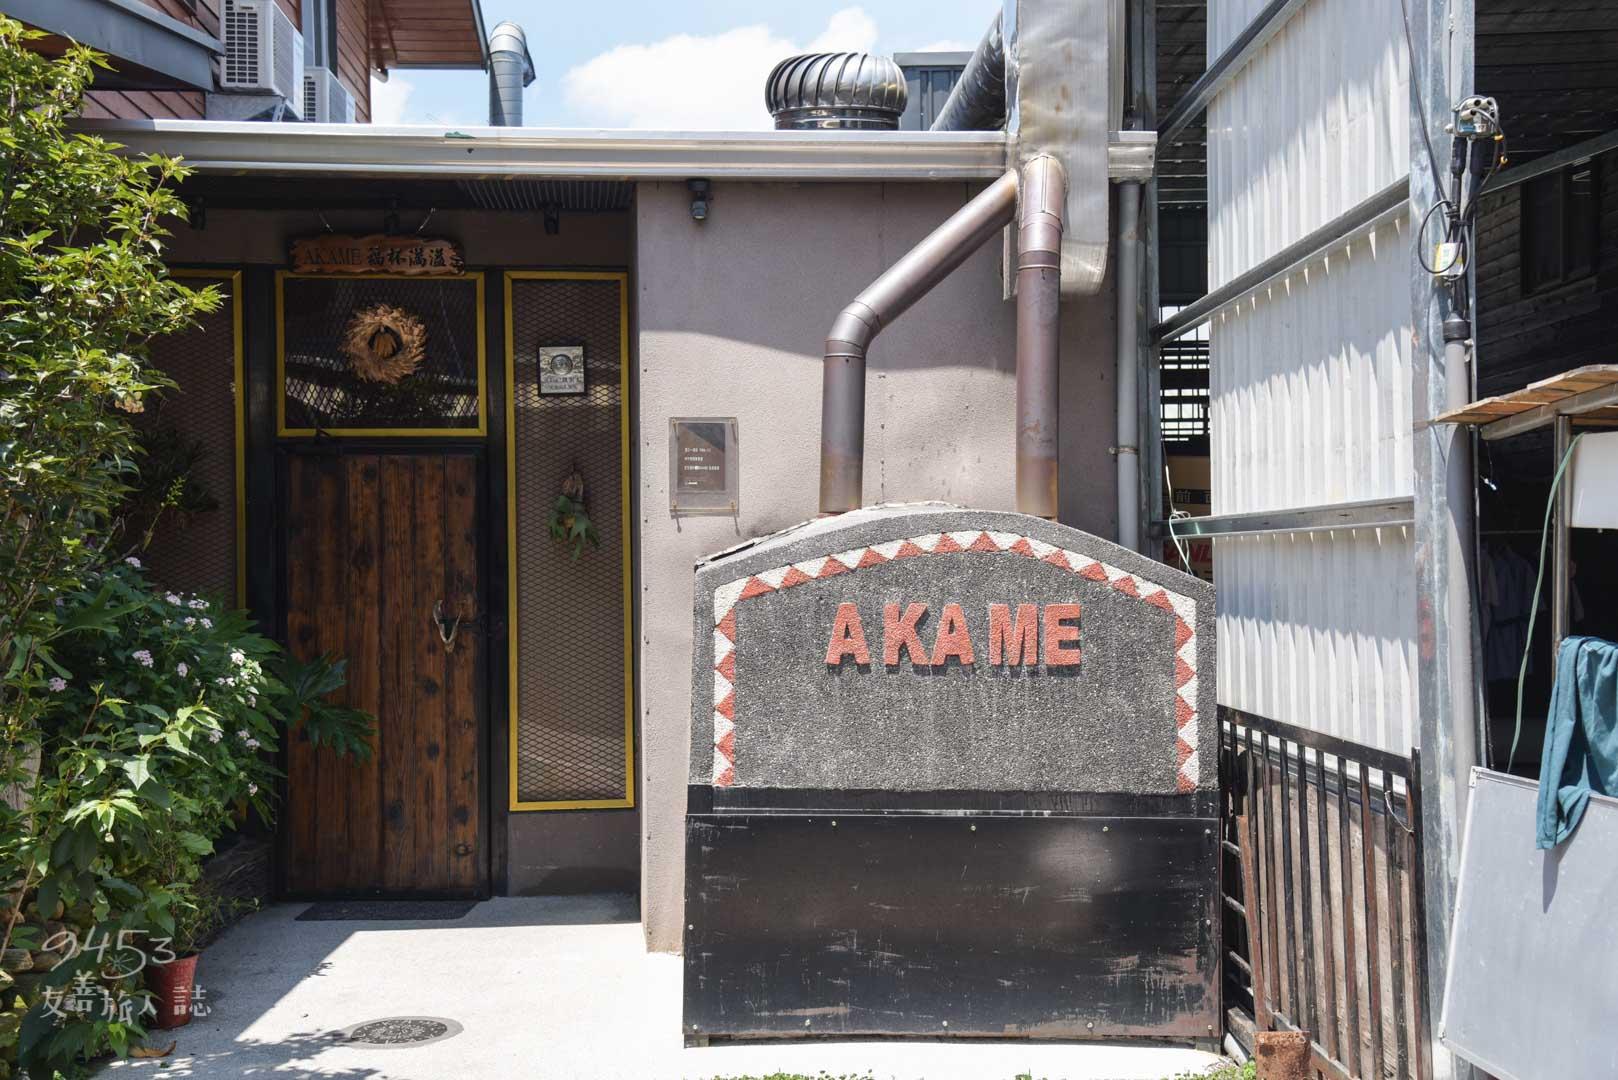 17巷人氣爆棚AKAME餐廳